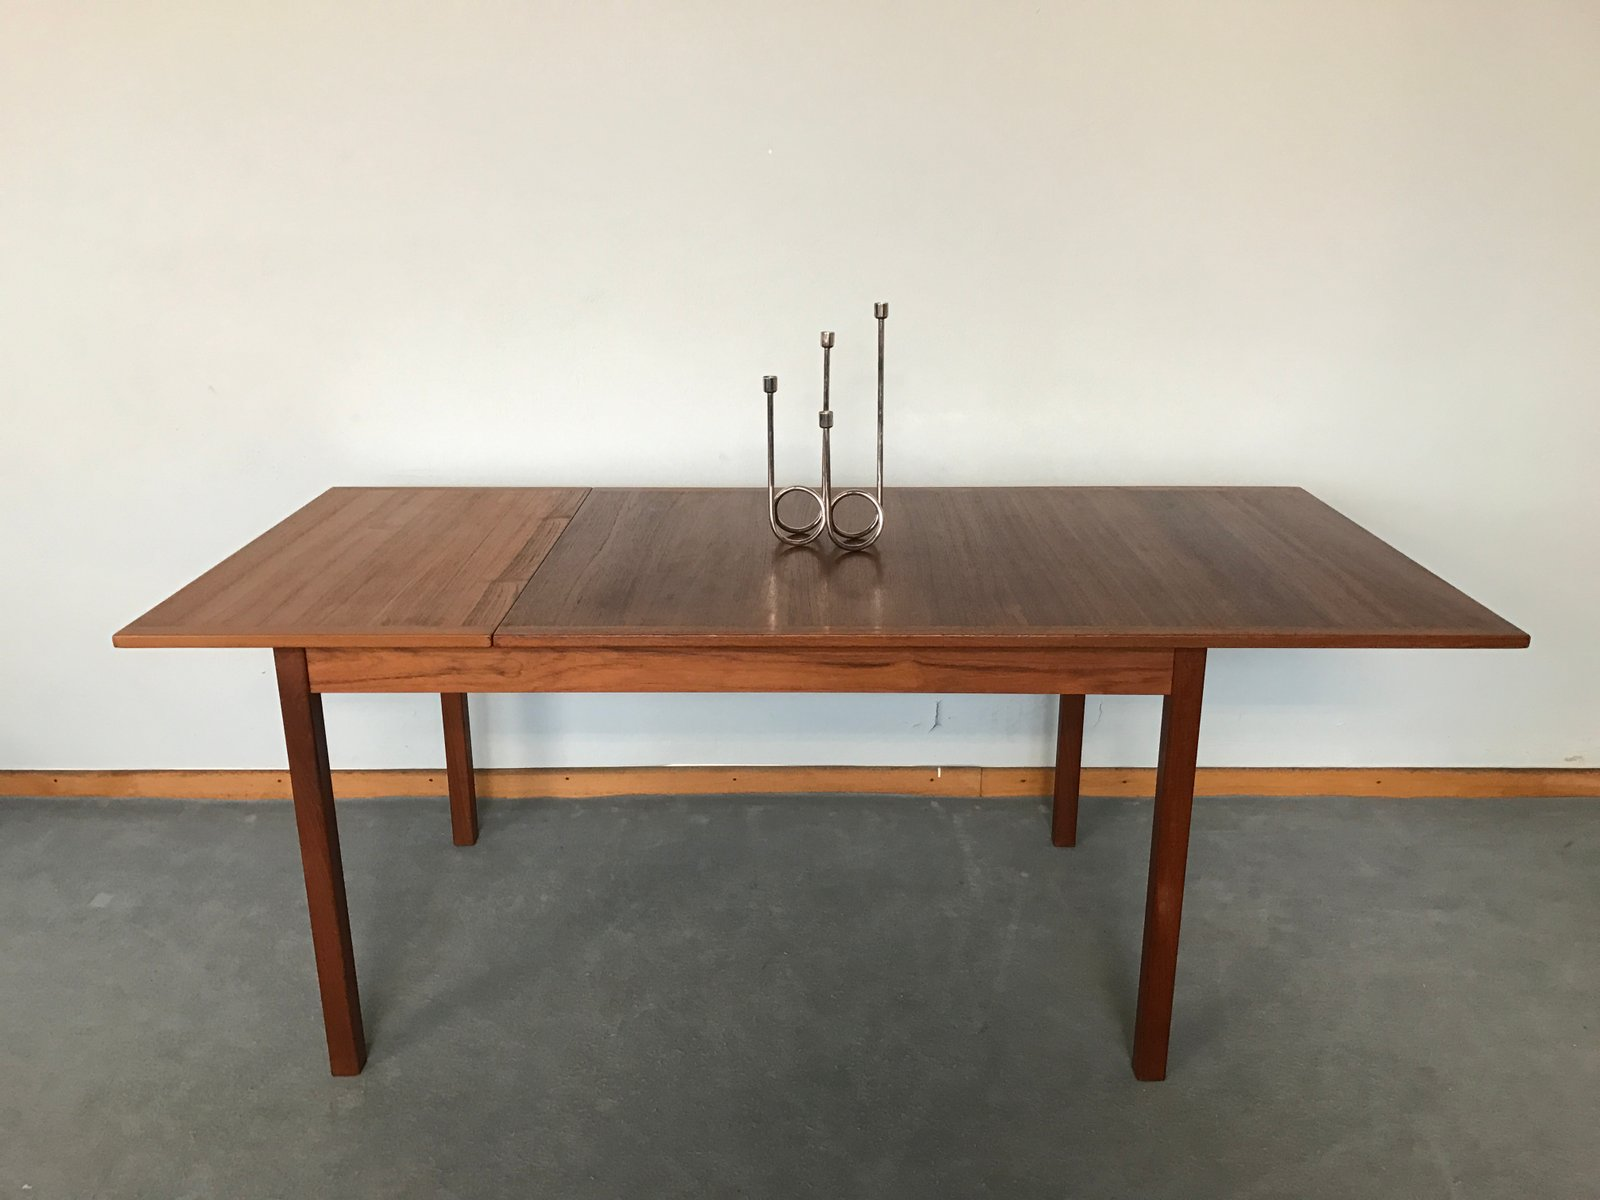 Vintage Scandinavian Teak Dining Table By Nils Jonsson 12. $1,199.00. Price  Per Piece